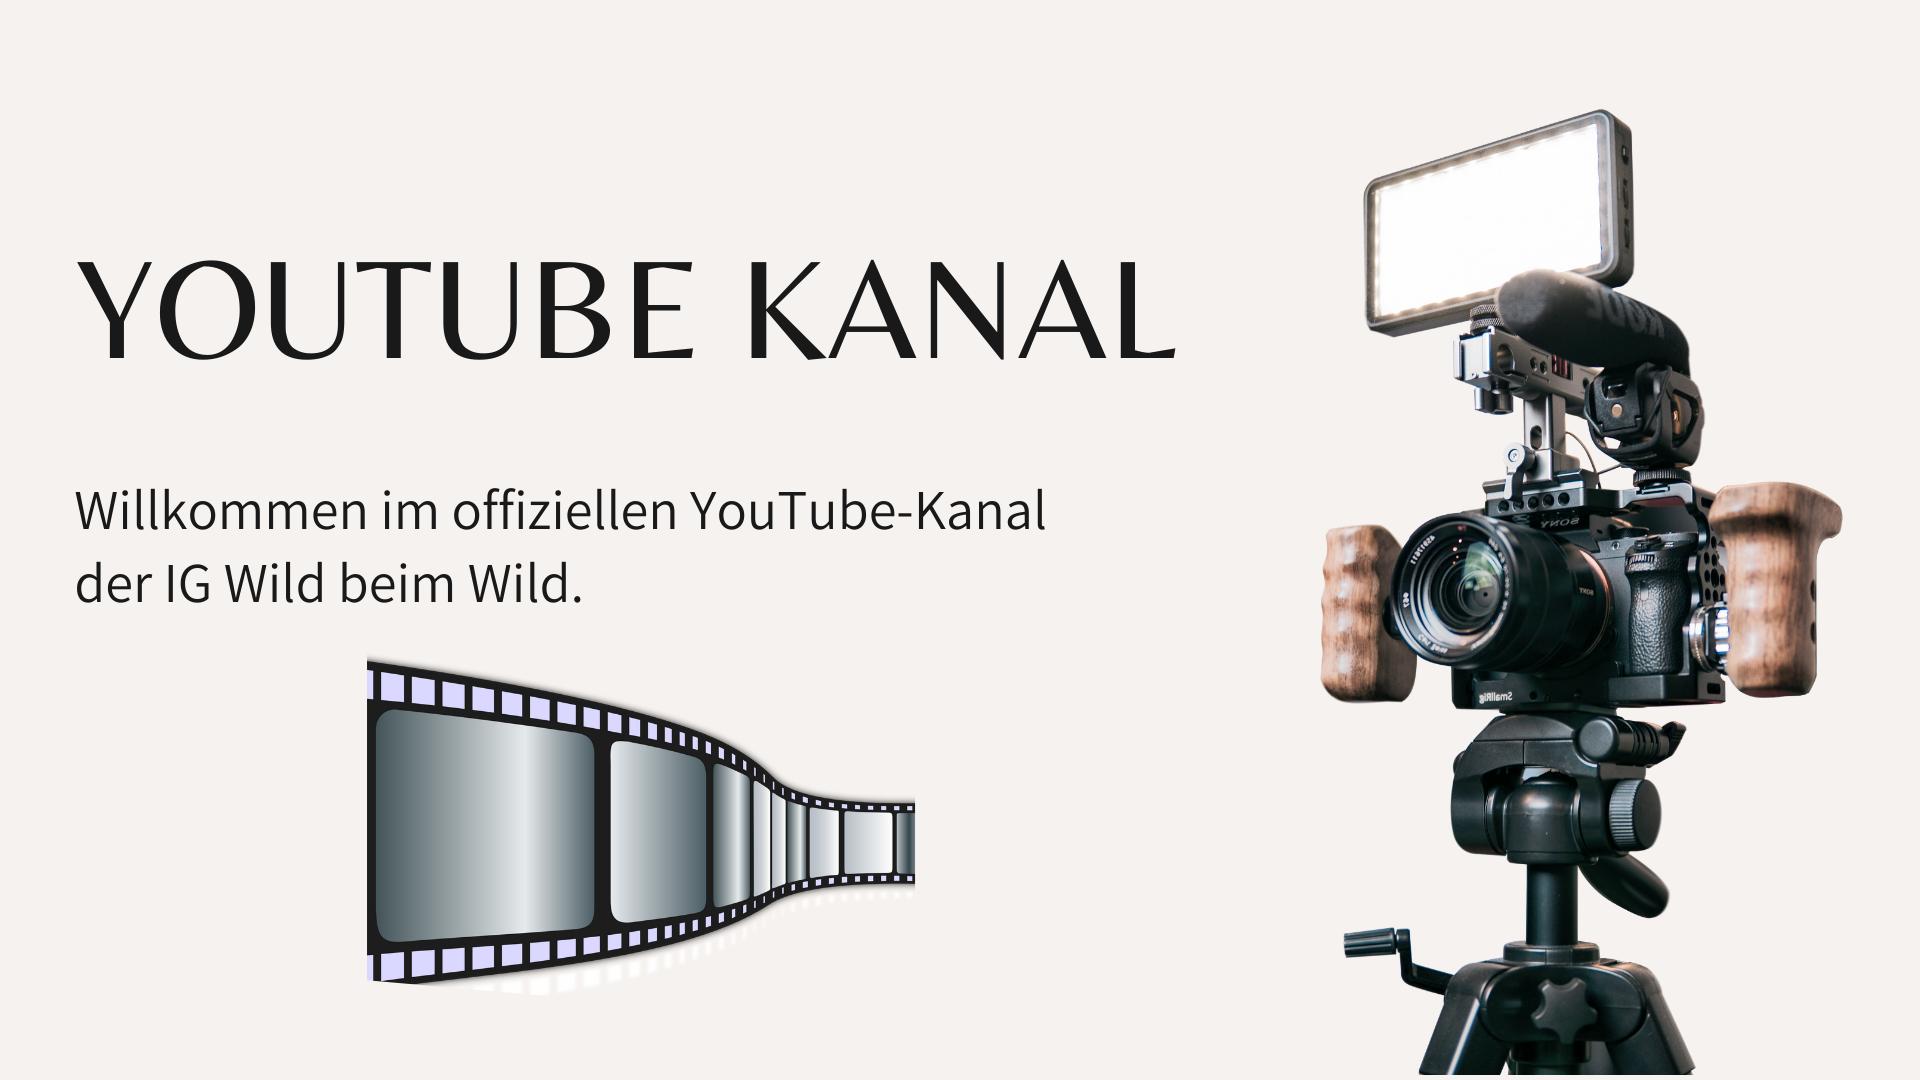 Youtube Kanal Wild beim Wild